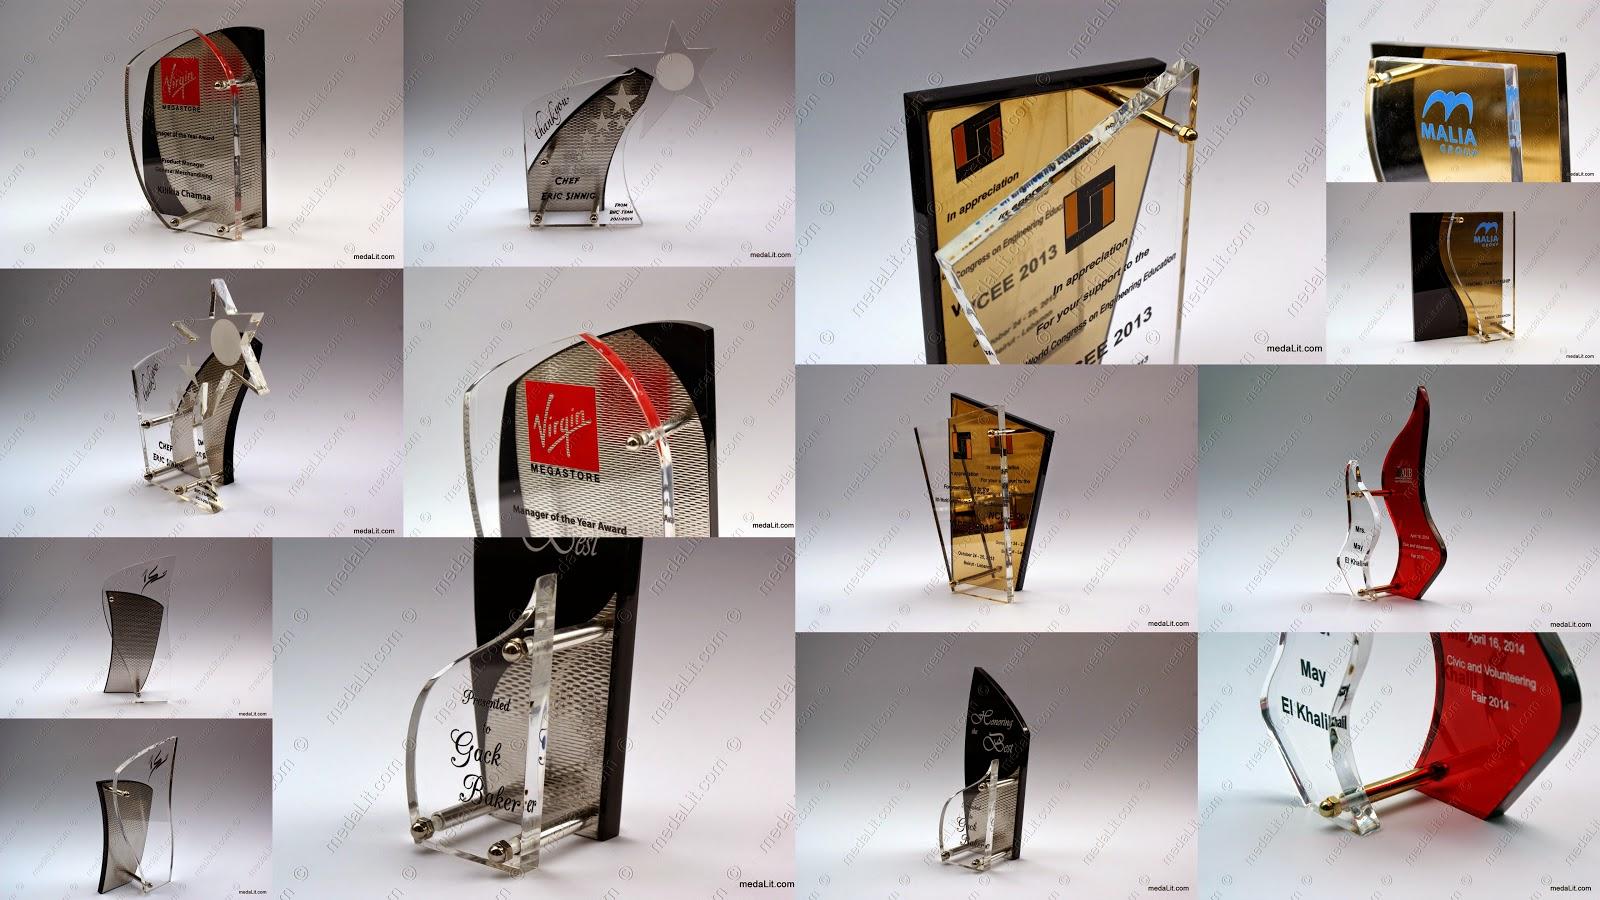 Lebanon Trophies. Novel Series by Absi co